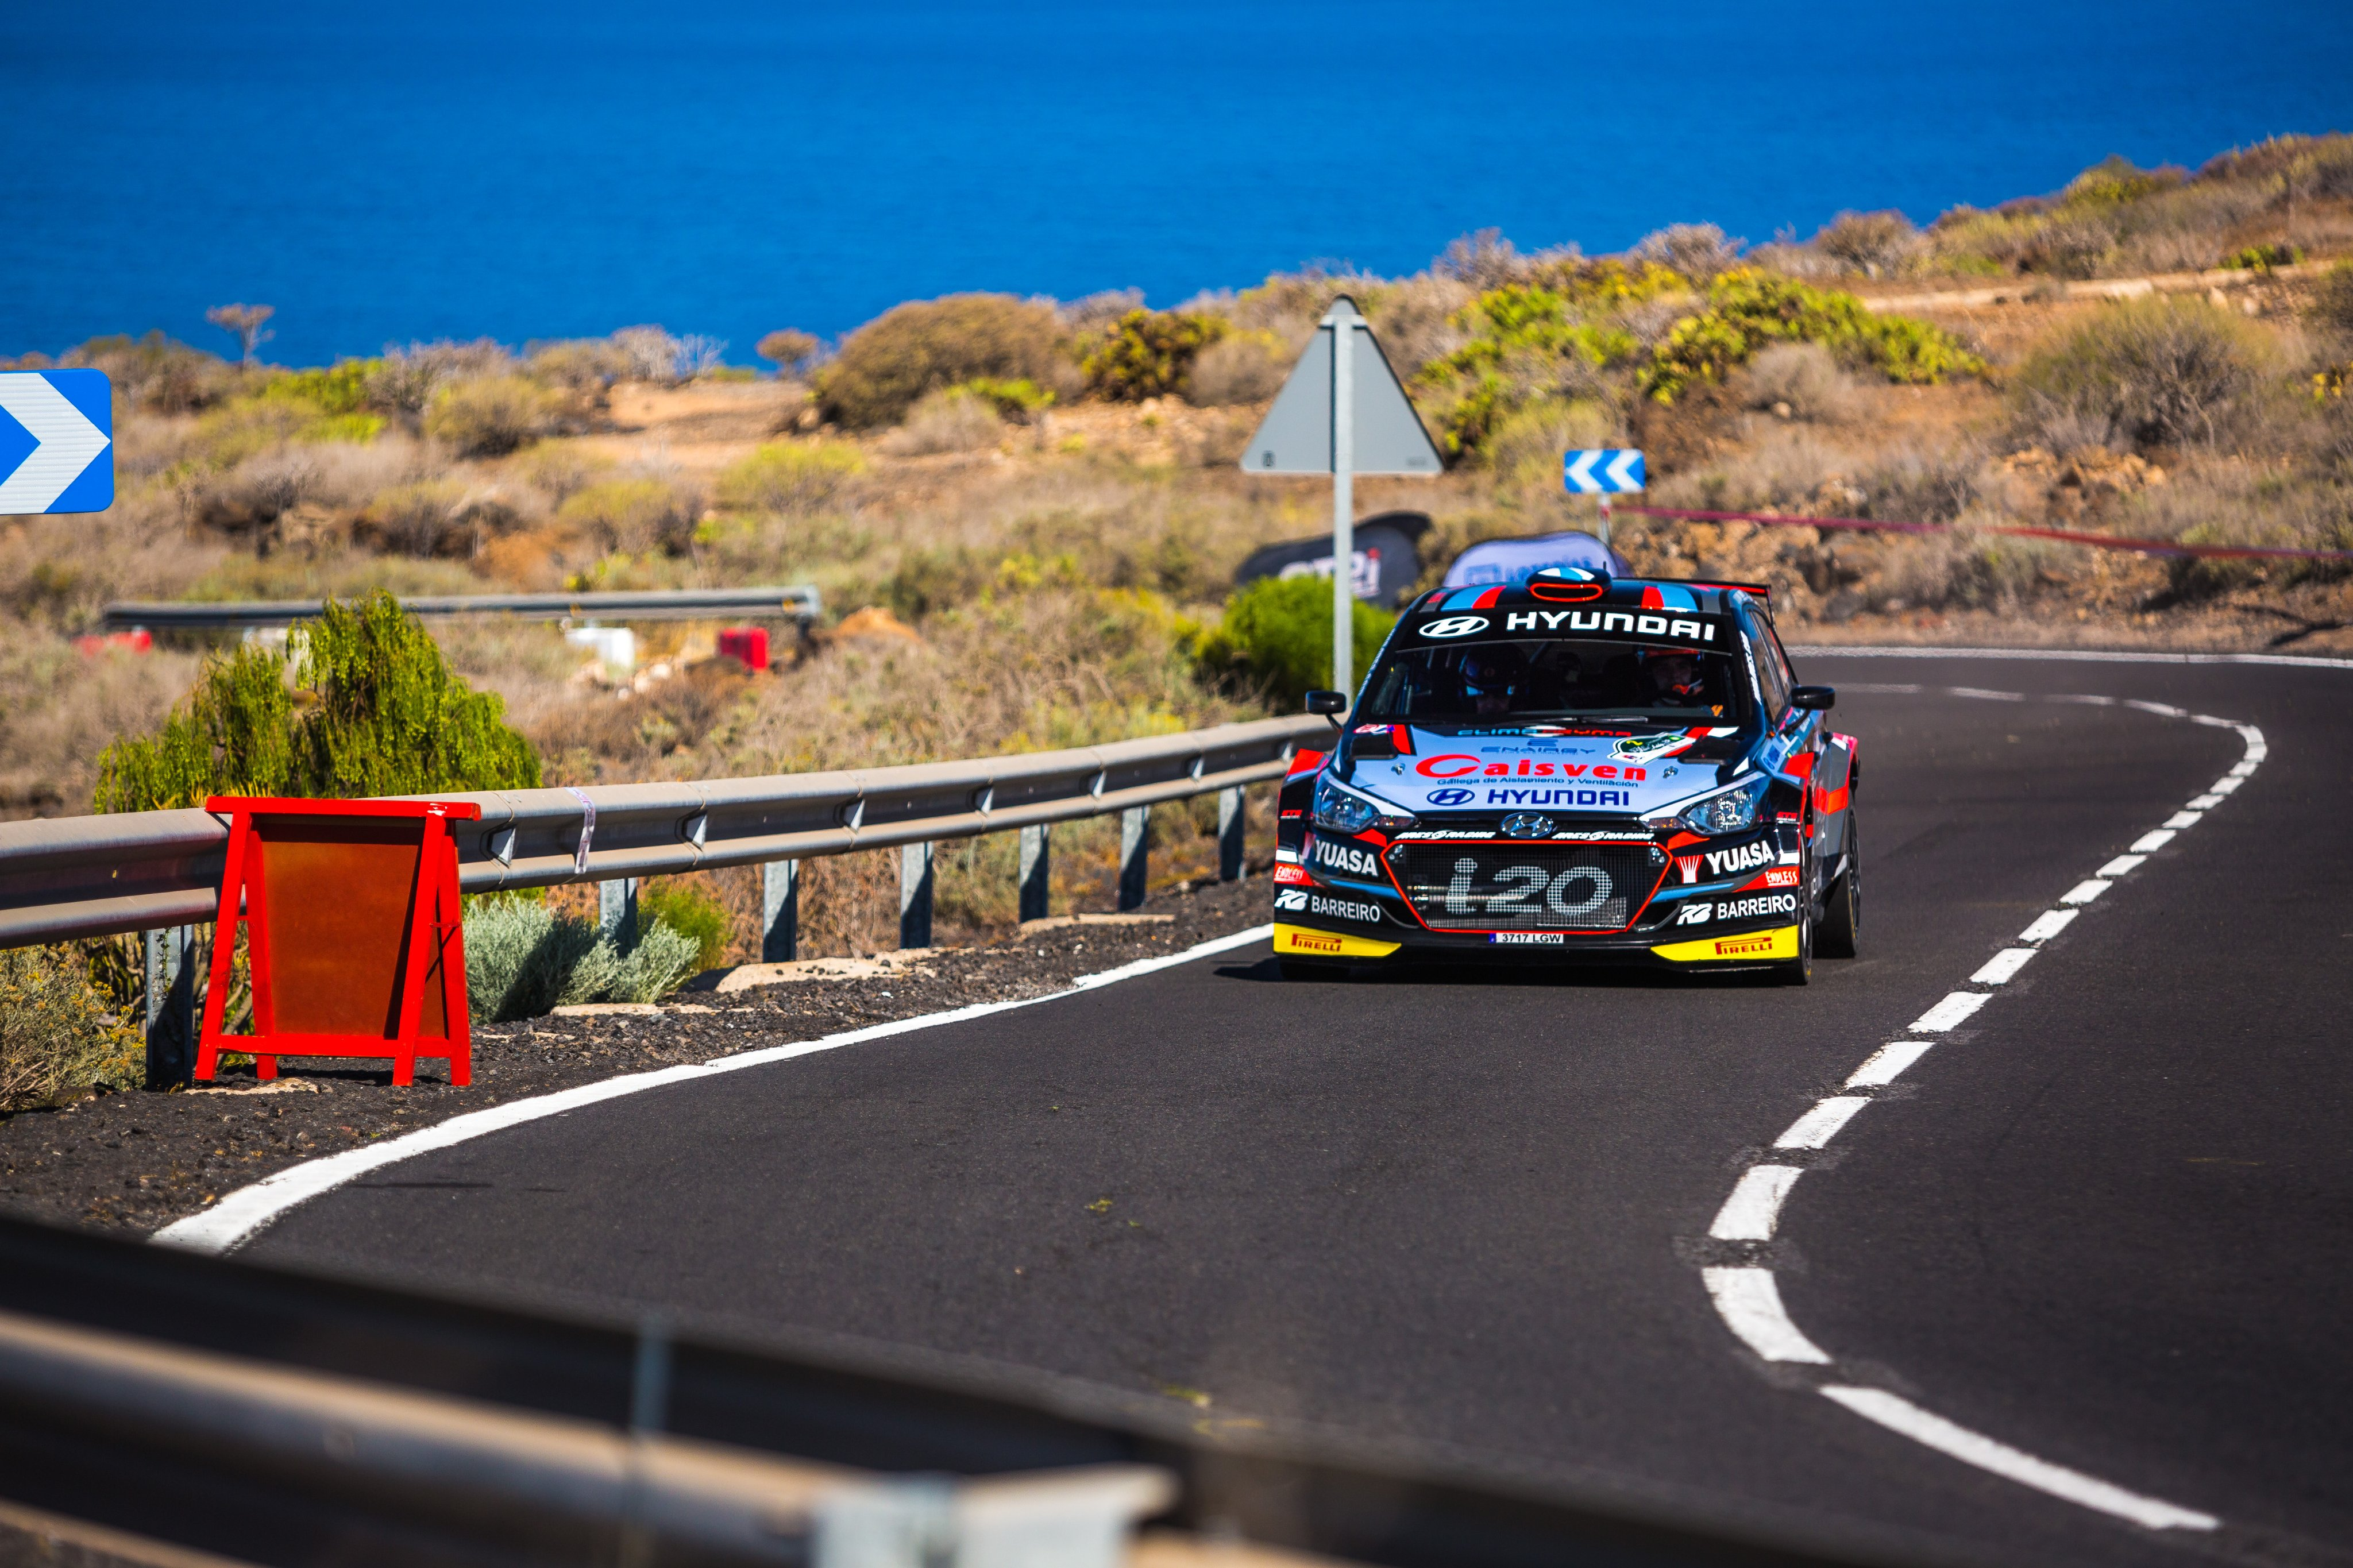 SCER: 30º Rallye Villa de Adeje BP Tenerife - Trofeo Cicar [13-15 Mayo] - Página 2 E1XKPoTWEAUCMxp?format=jpg&name=4096x4096